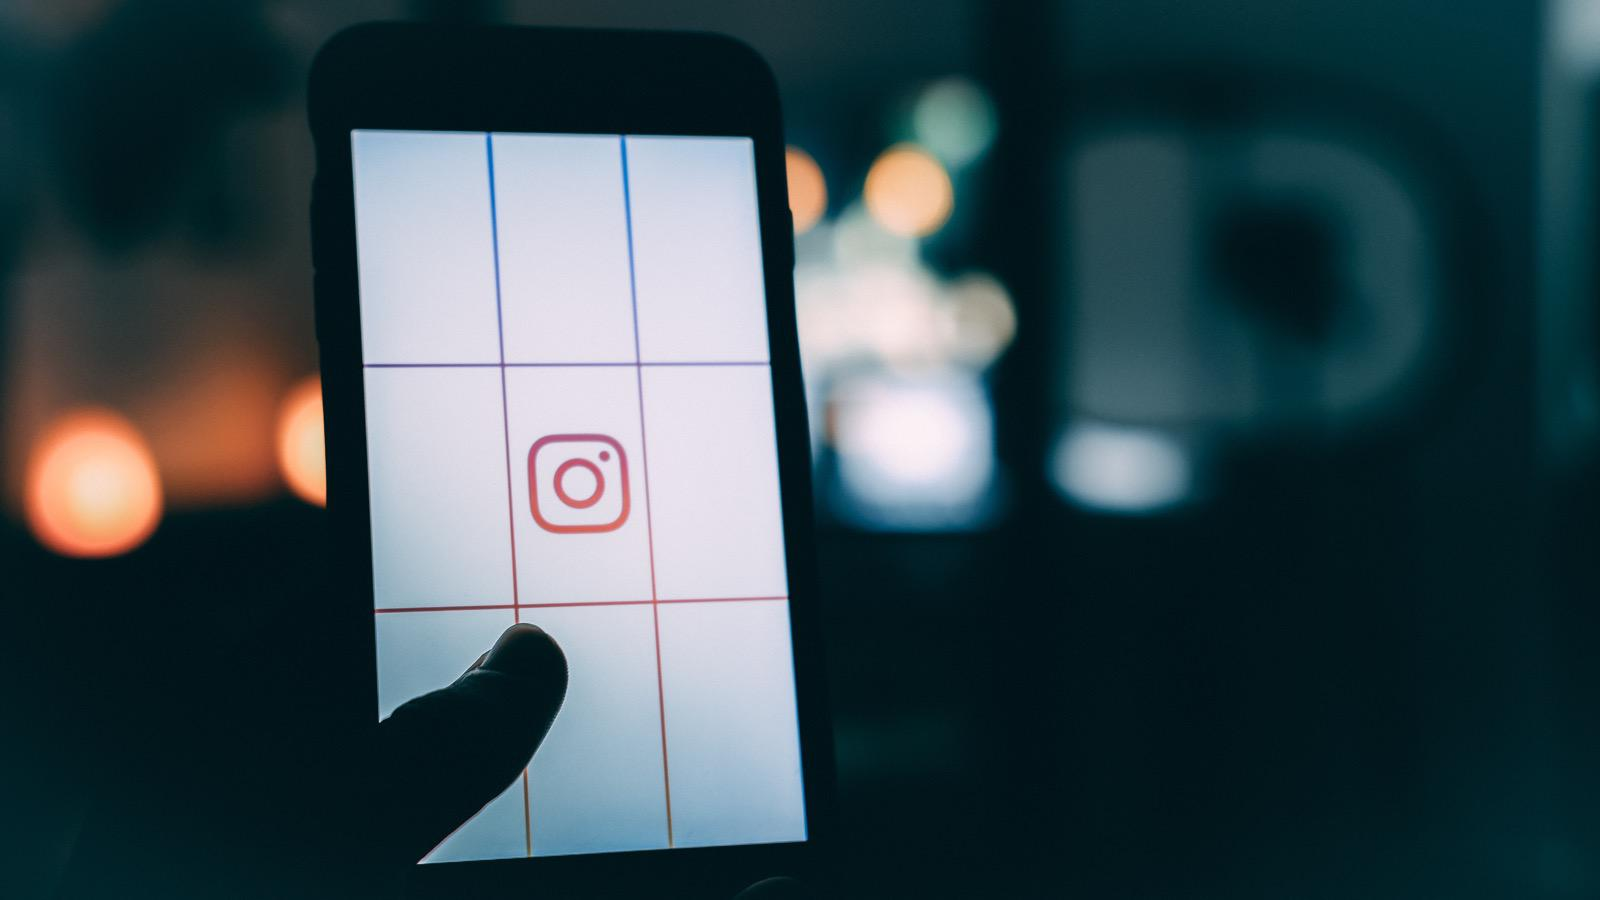 engagement instagram wombo